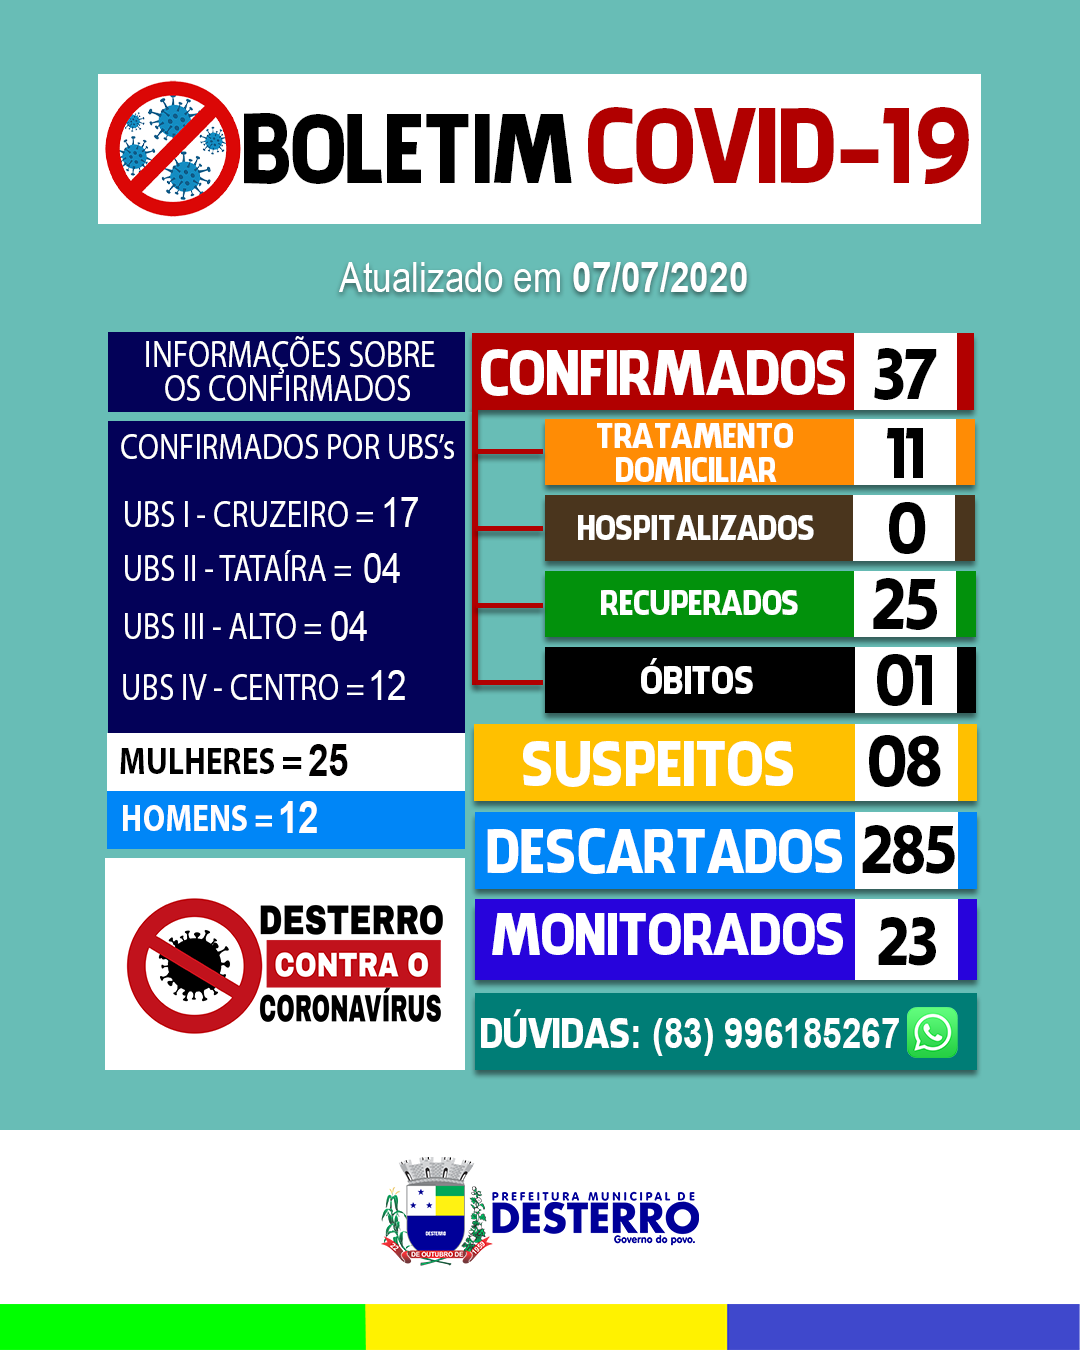 Boletim Covid-19 (07/07/2020)